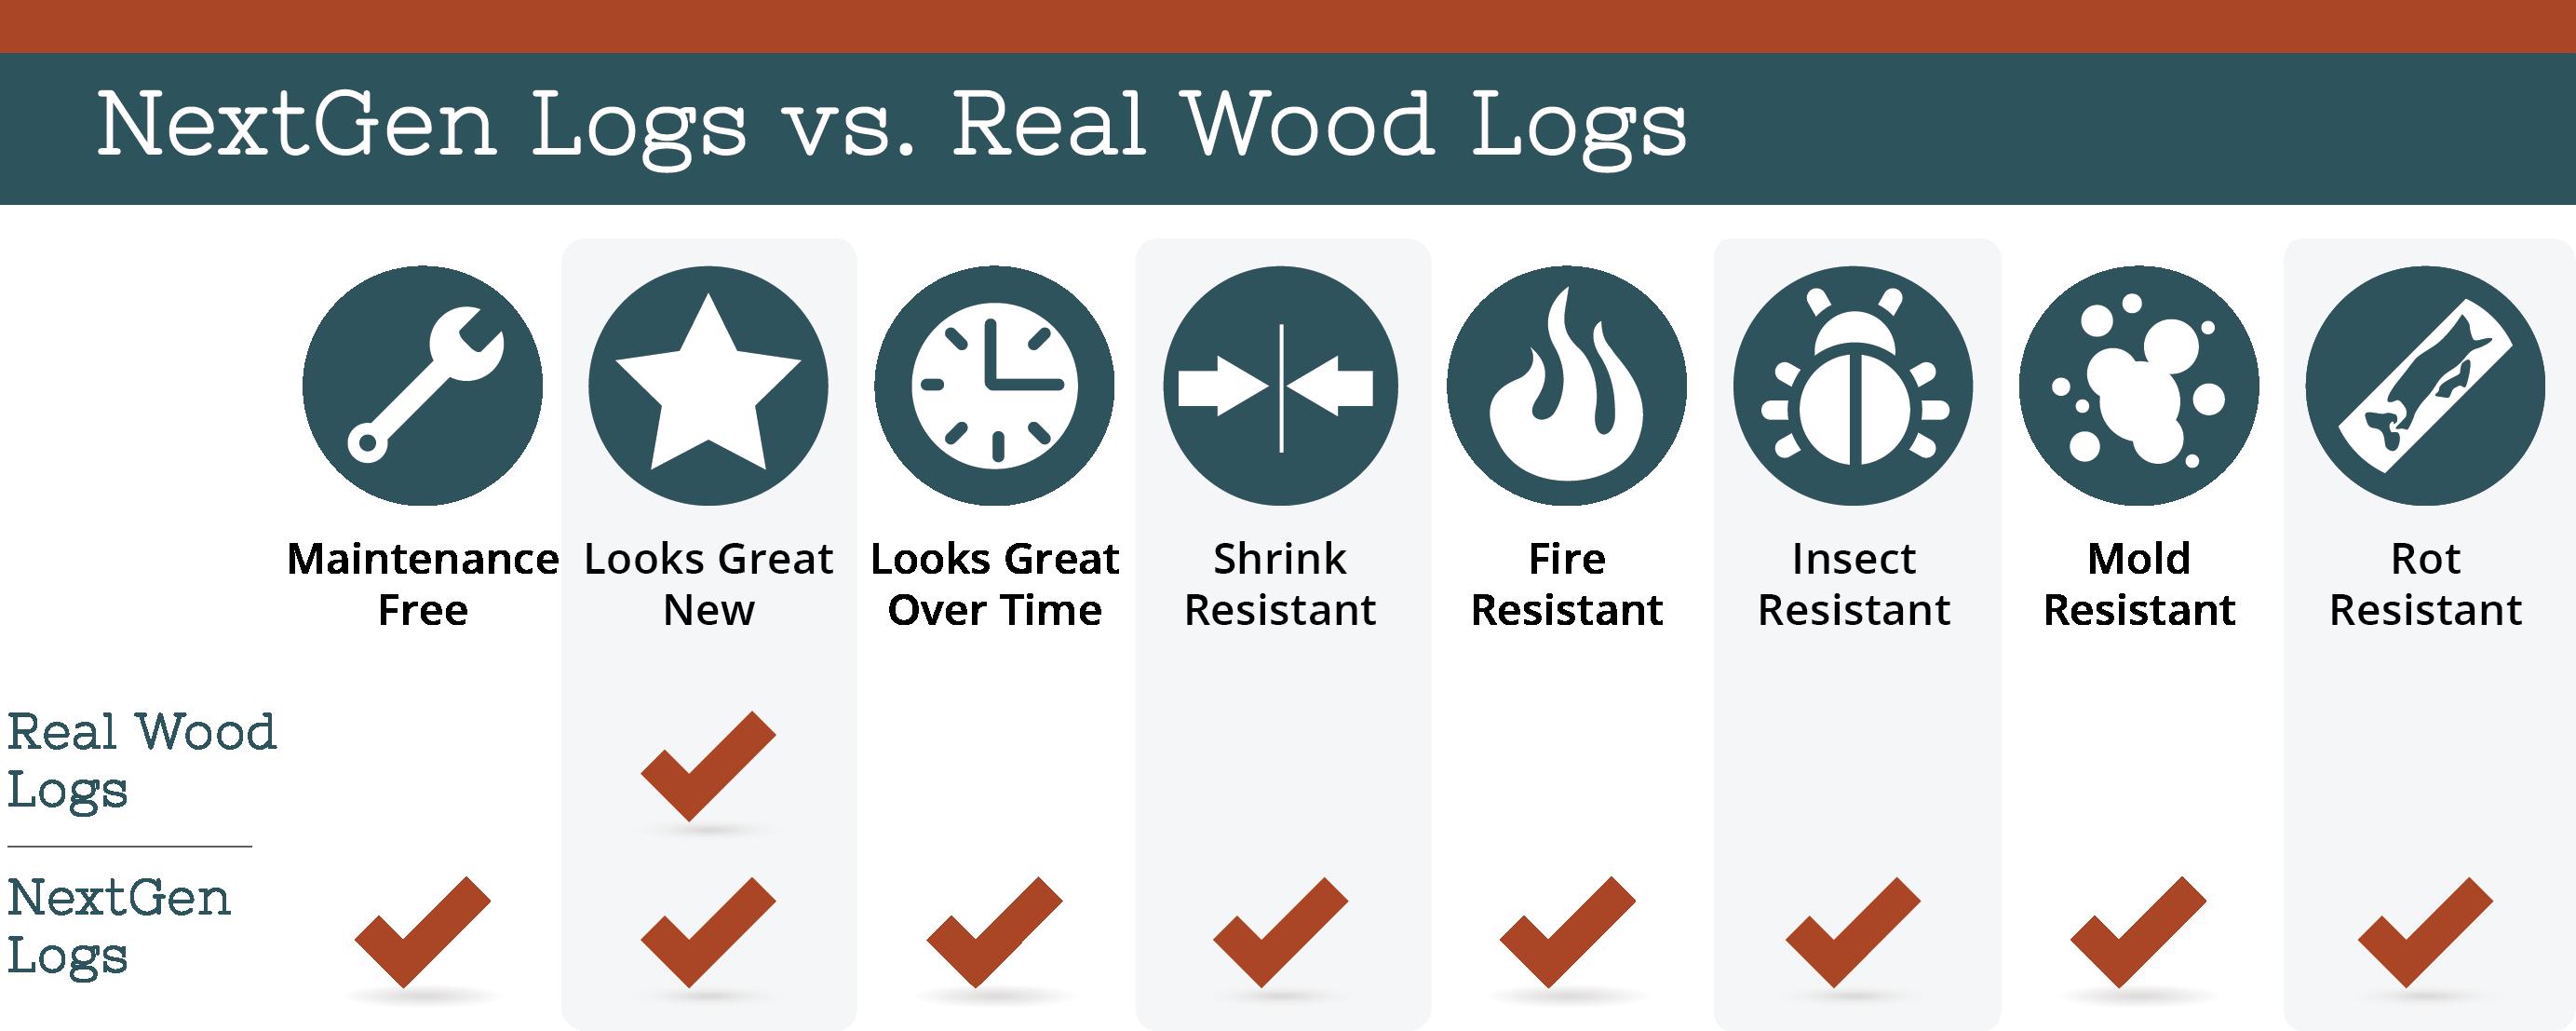 nextgen_logs_concrete_log_siding_nextgen_logs_vs_real_wood_logs_chart